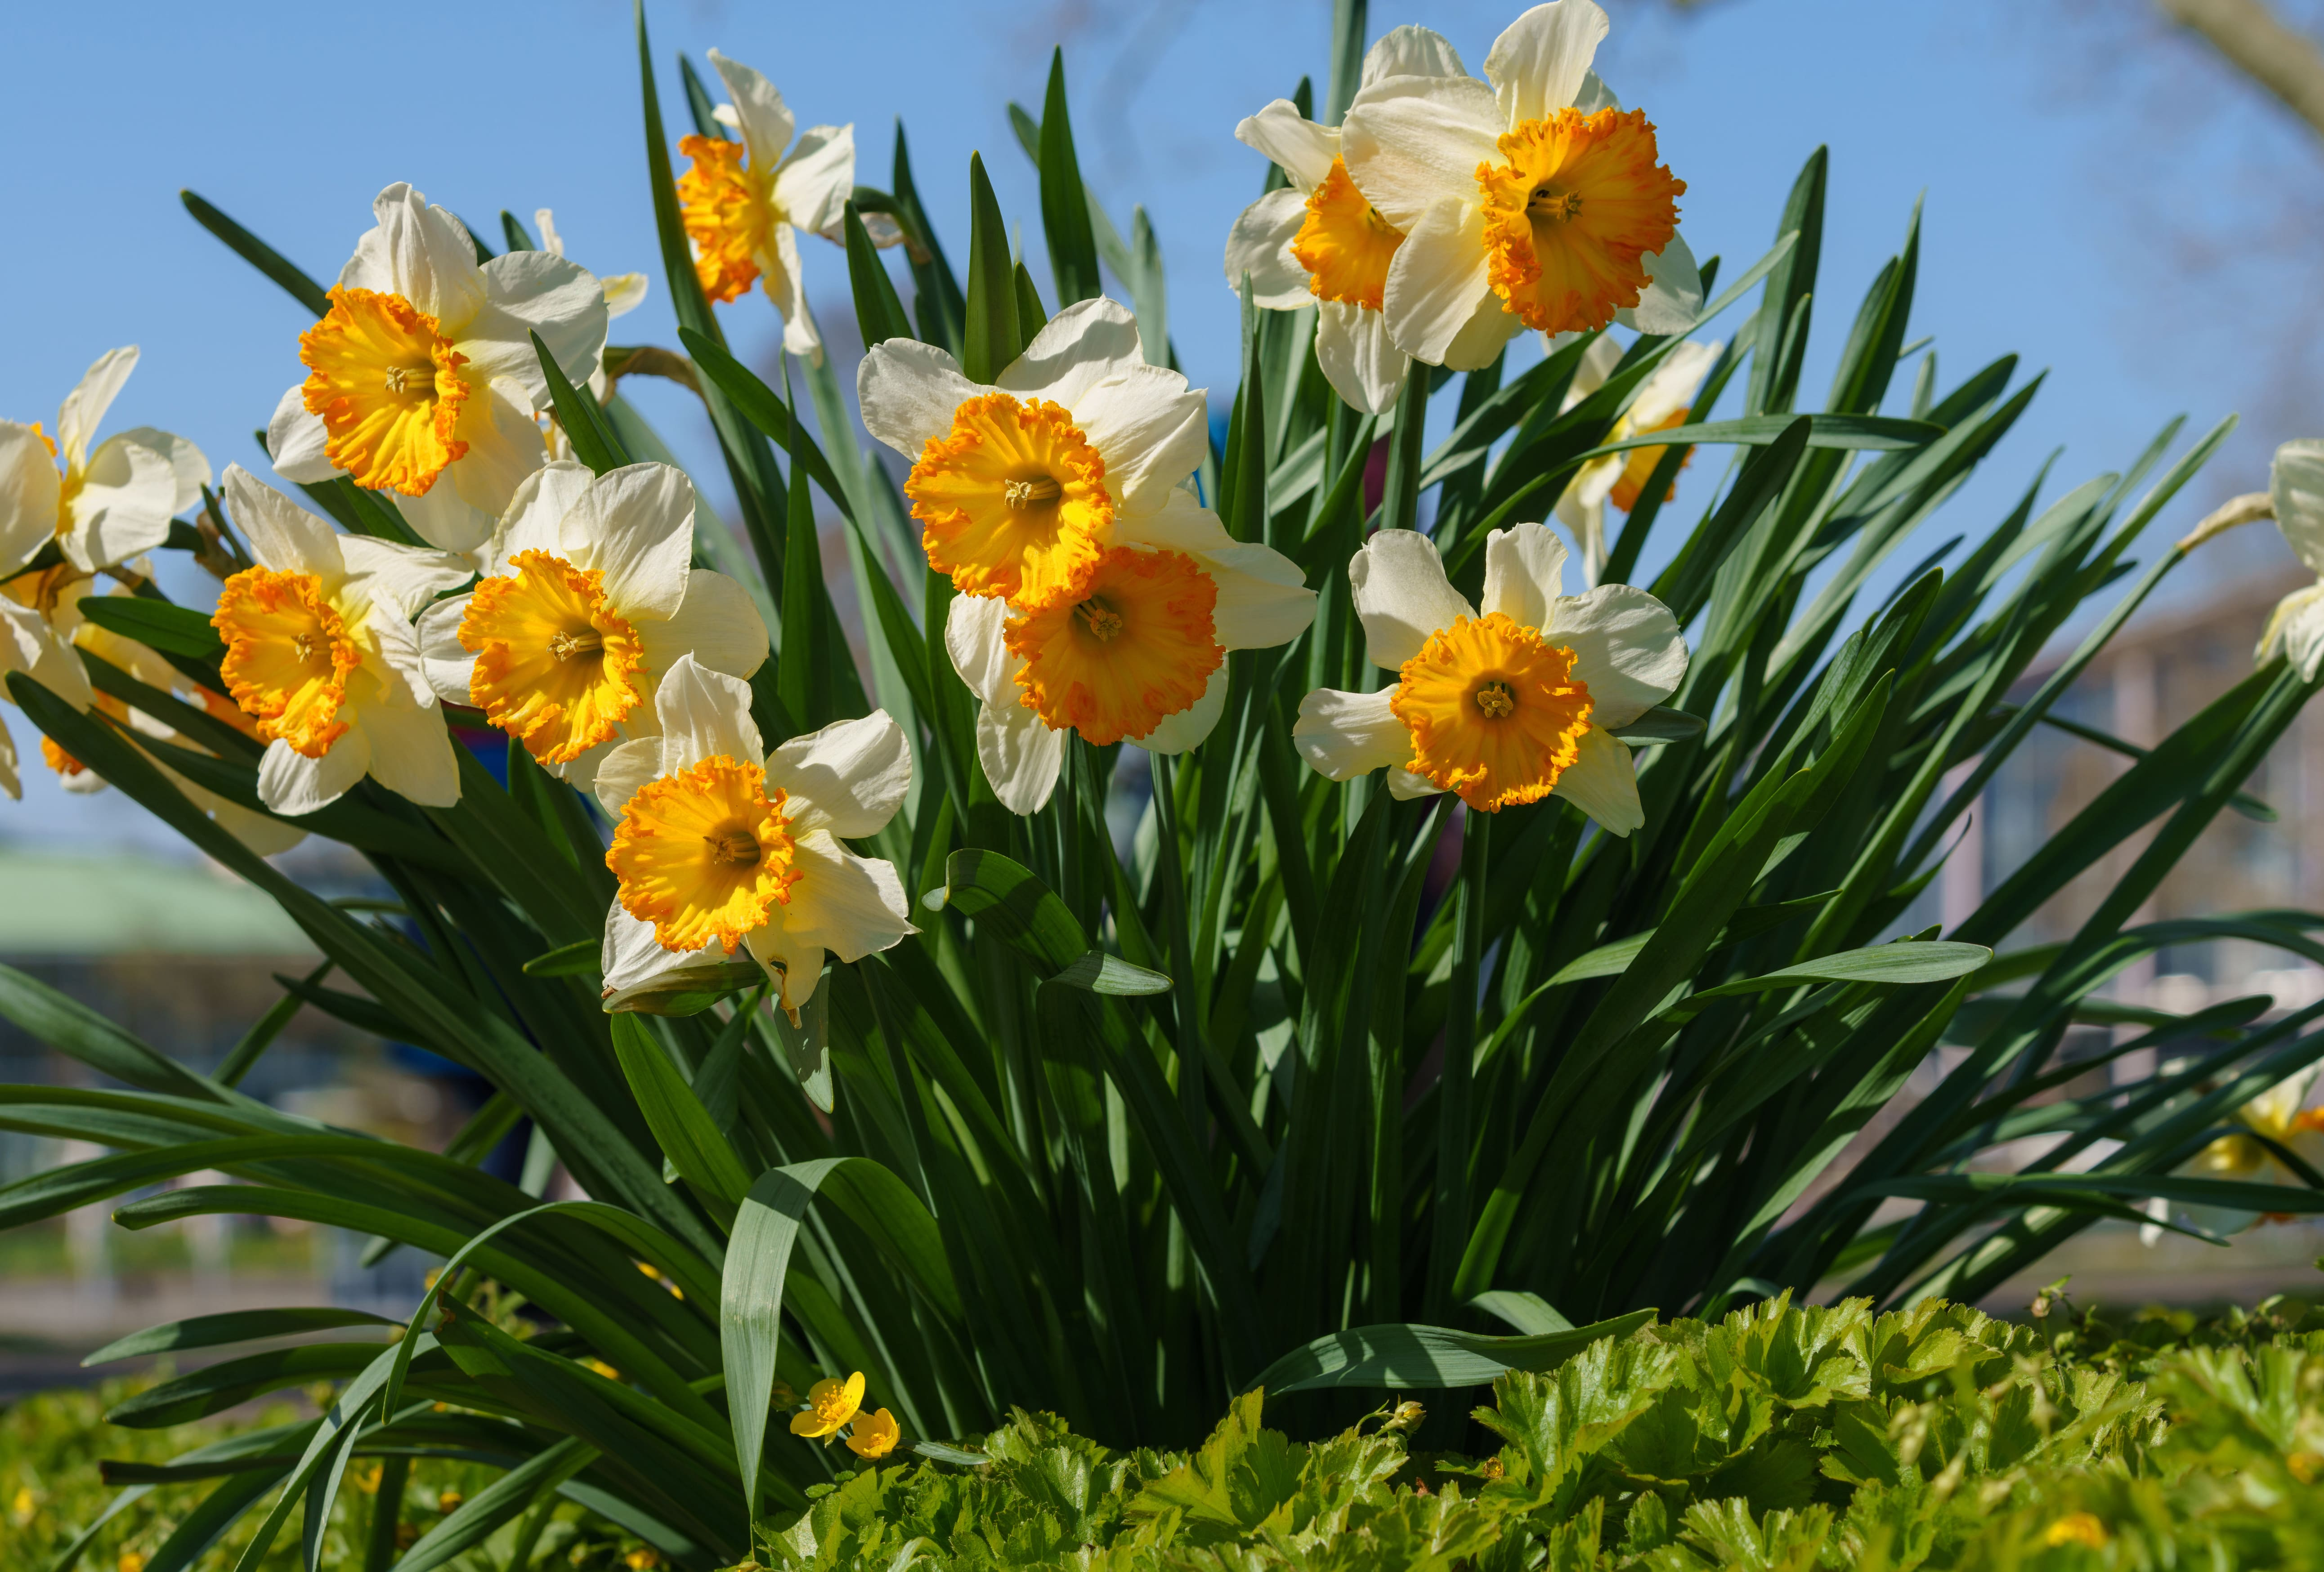 daffodils-photo-60